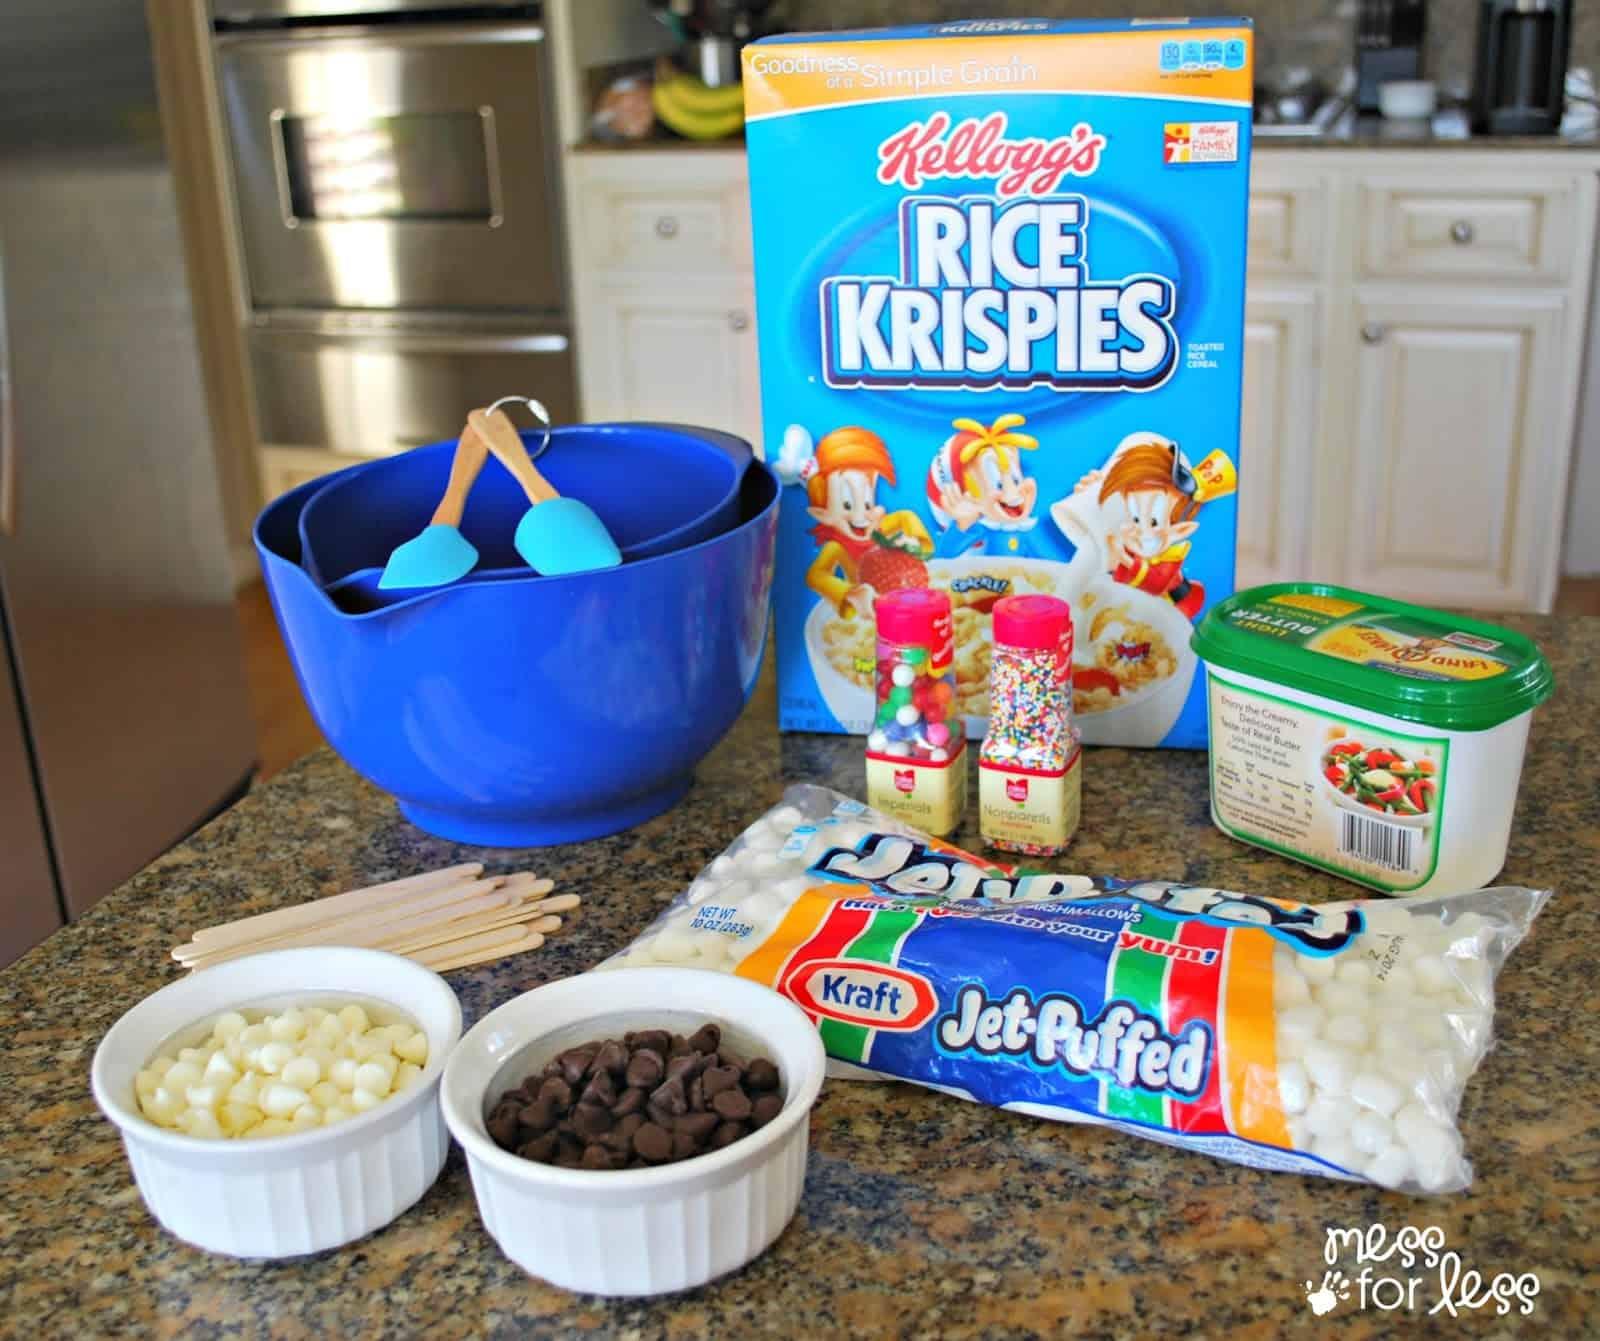 Home handmade candies chocolate dipped rice krispy treats 2 - Ingredients For Rice Krispies Treats Ad Easytomake